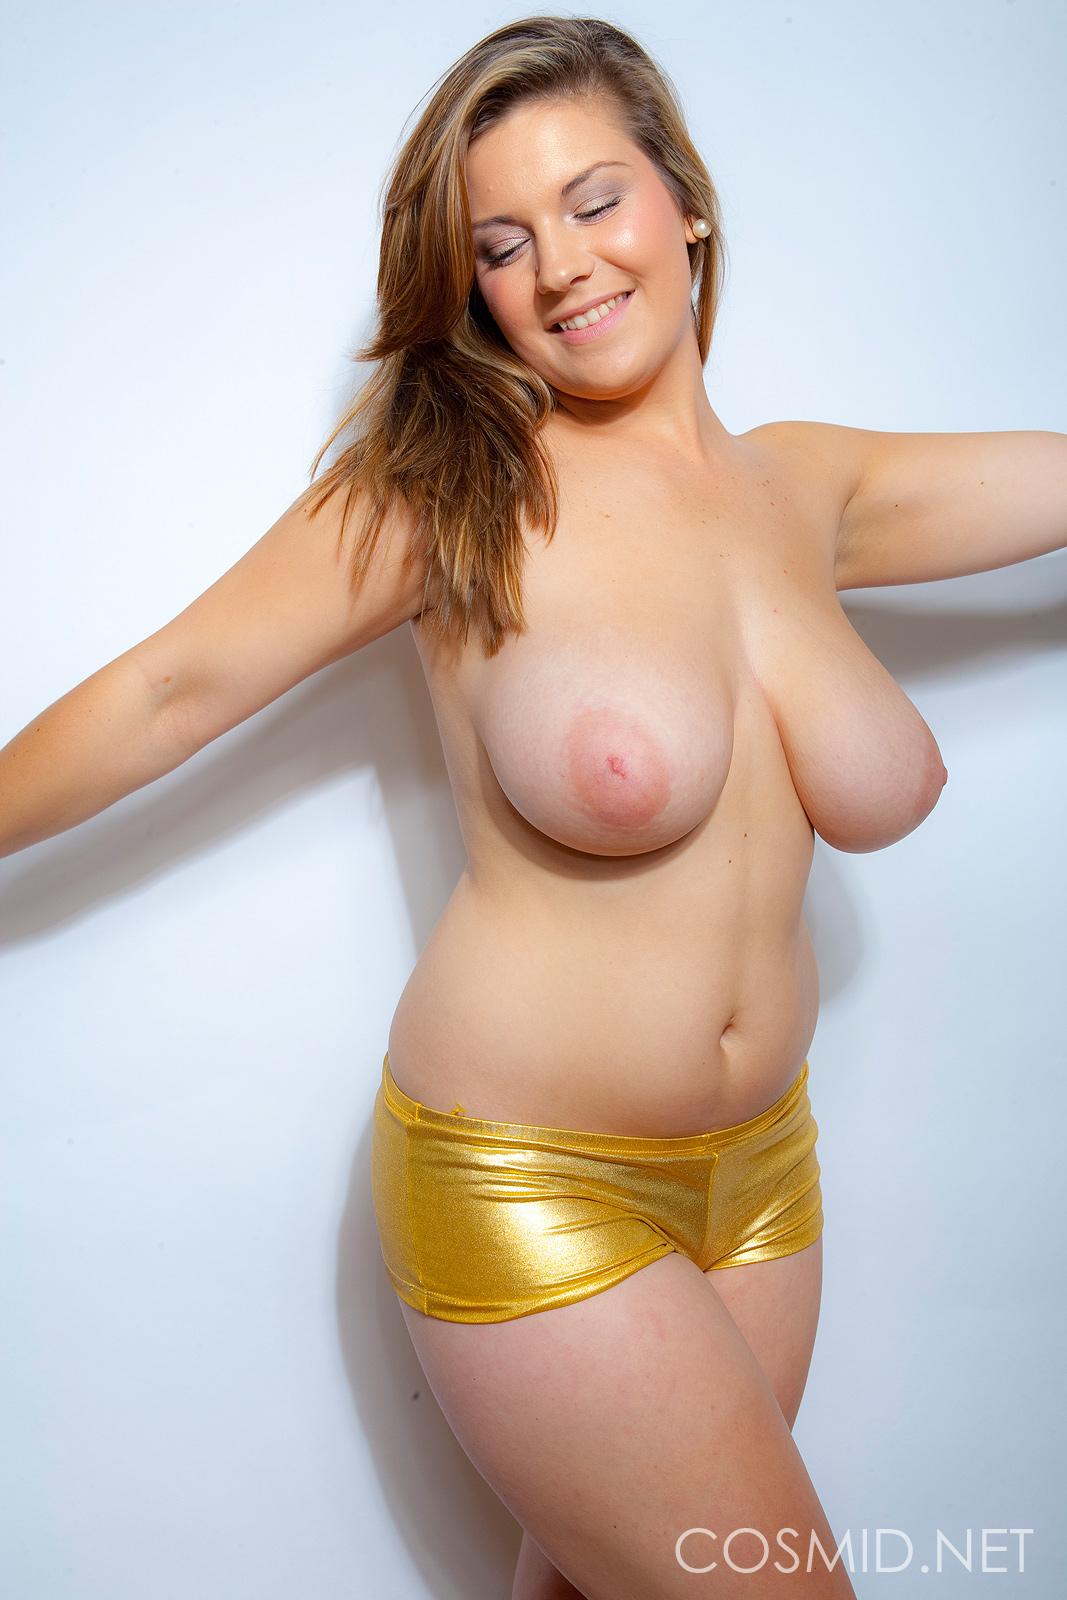 Hannah simone nude porn understood